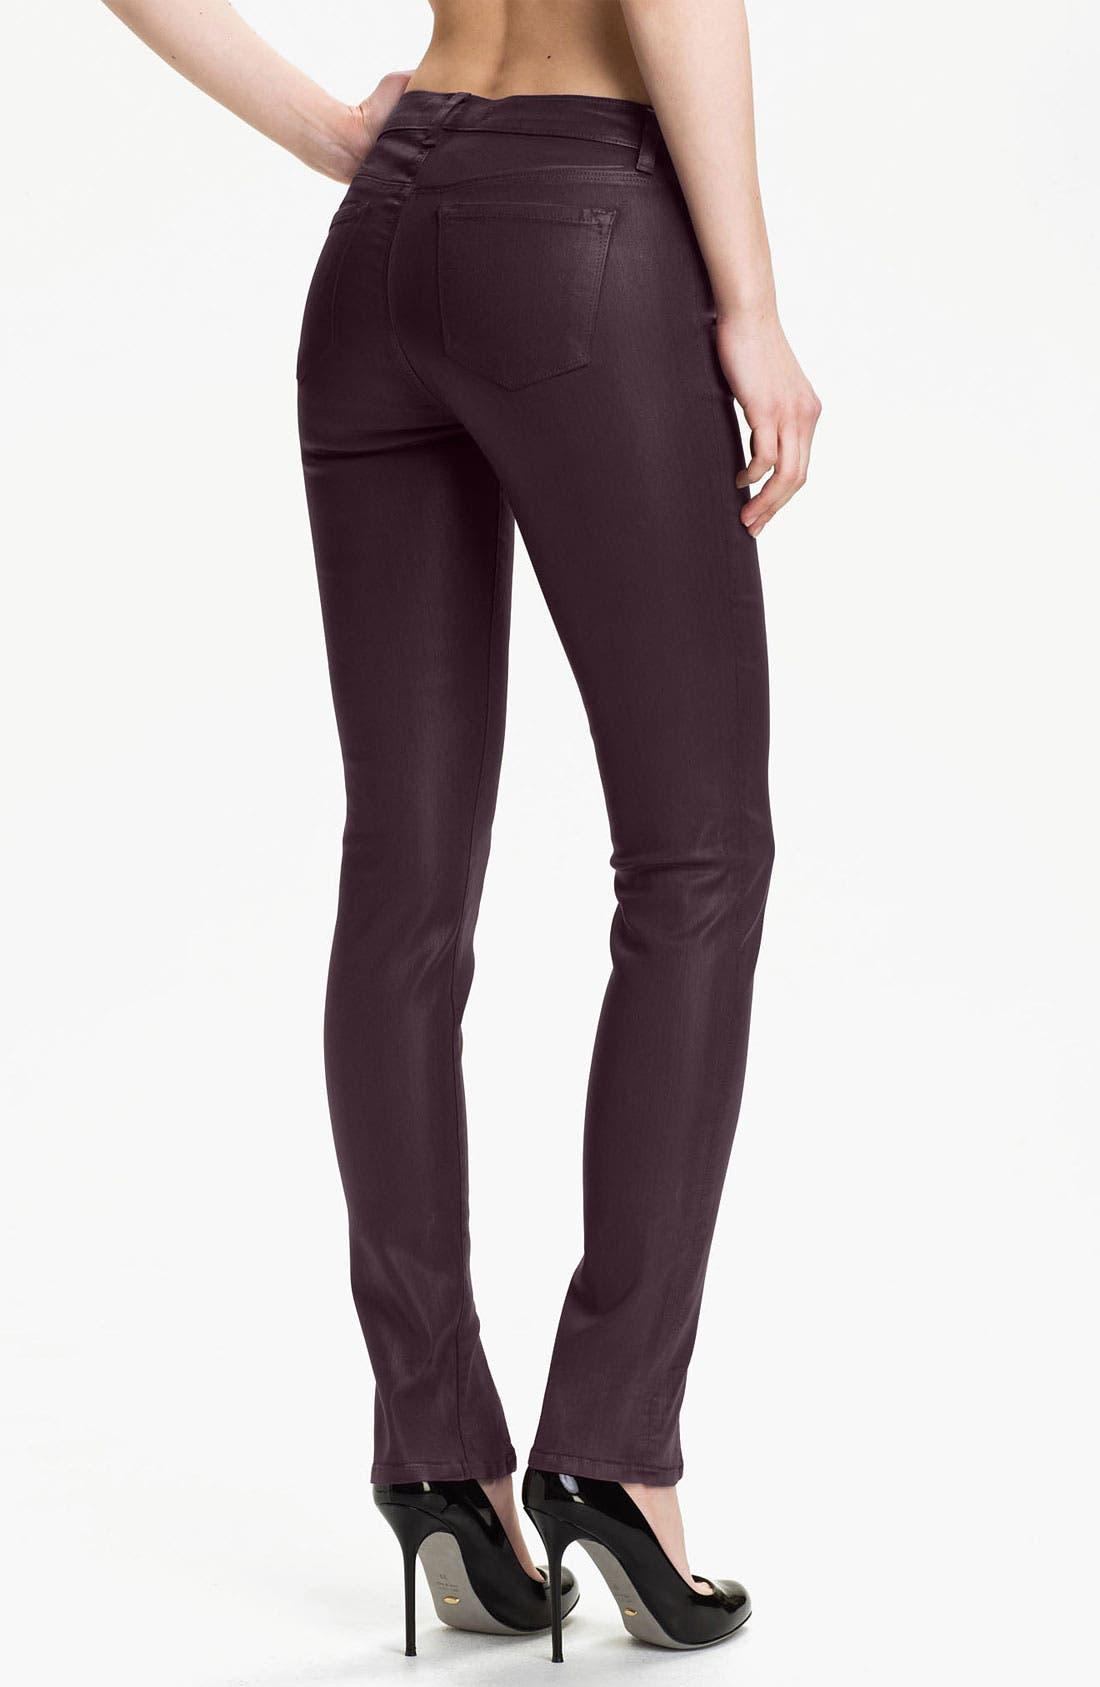 Alternate Image 2  - J Brand 'Vera' Slit Hem Skinny Jeans (Coated Dark)